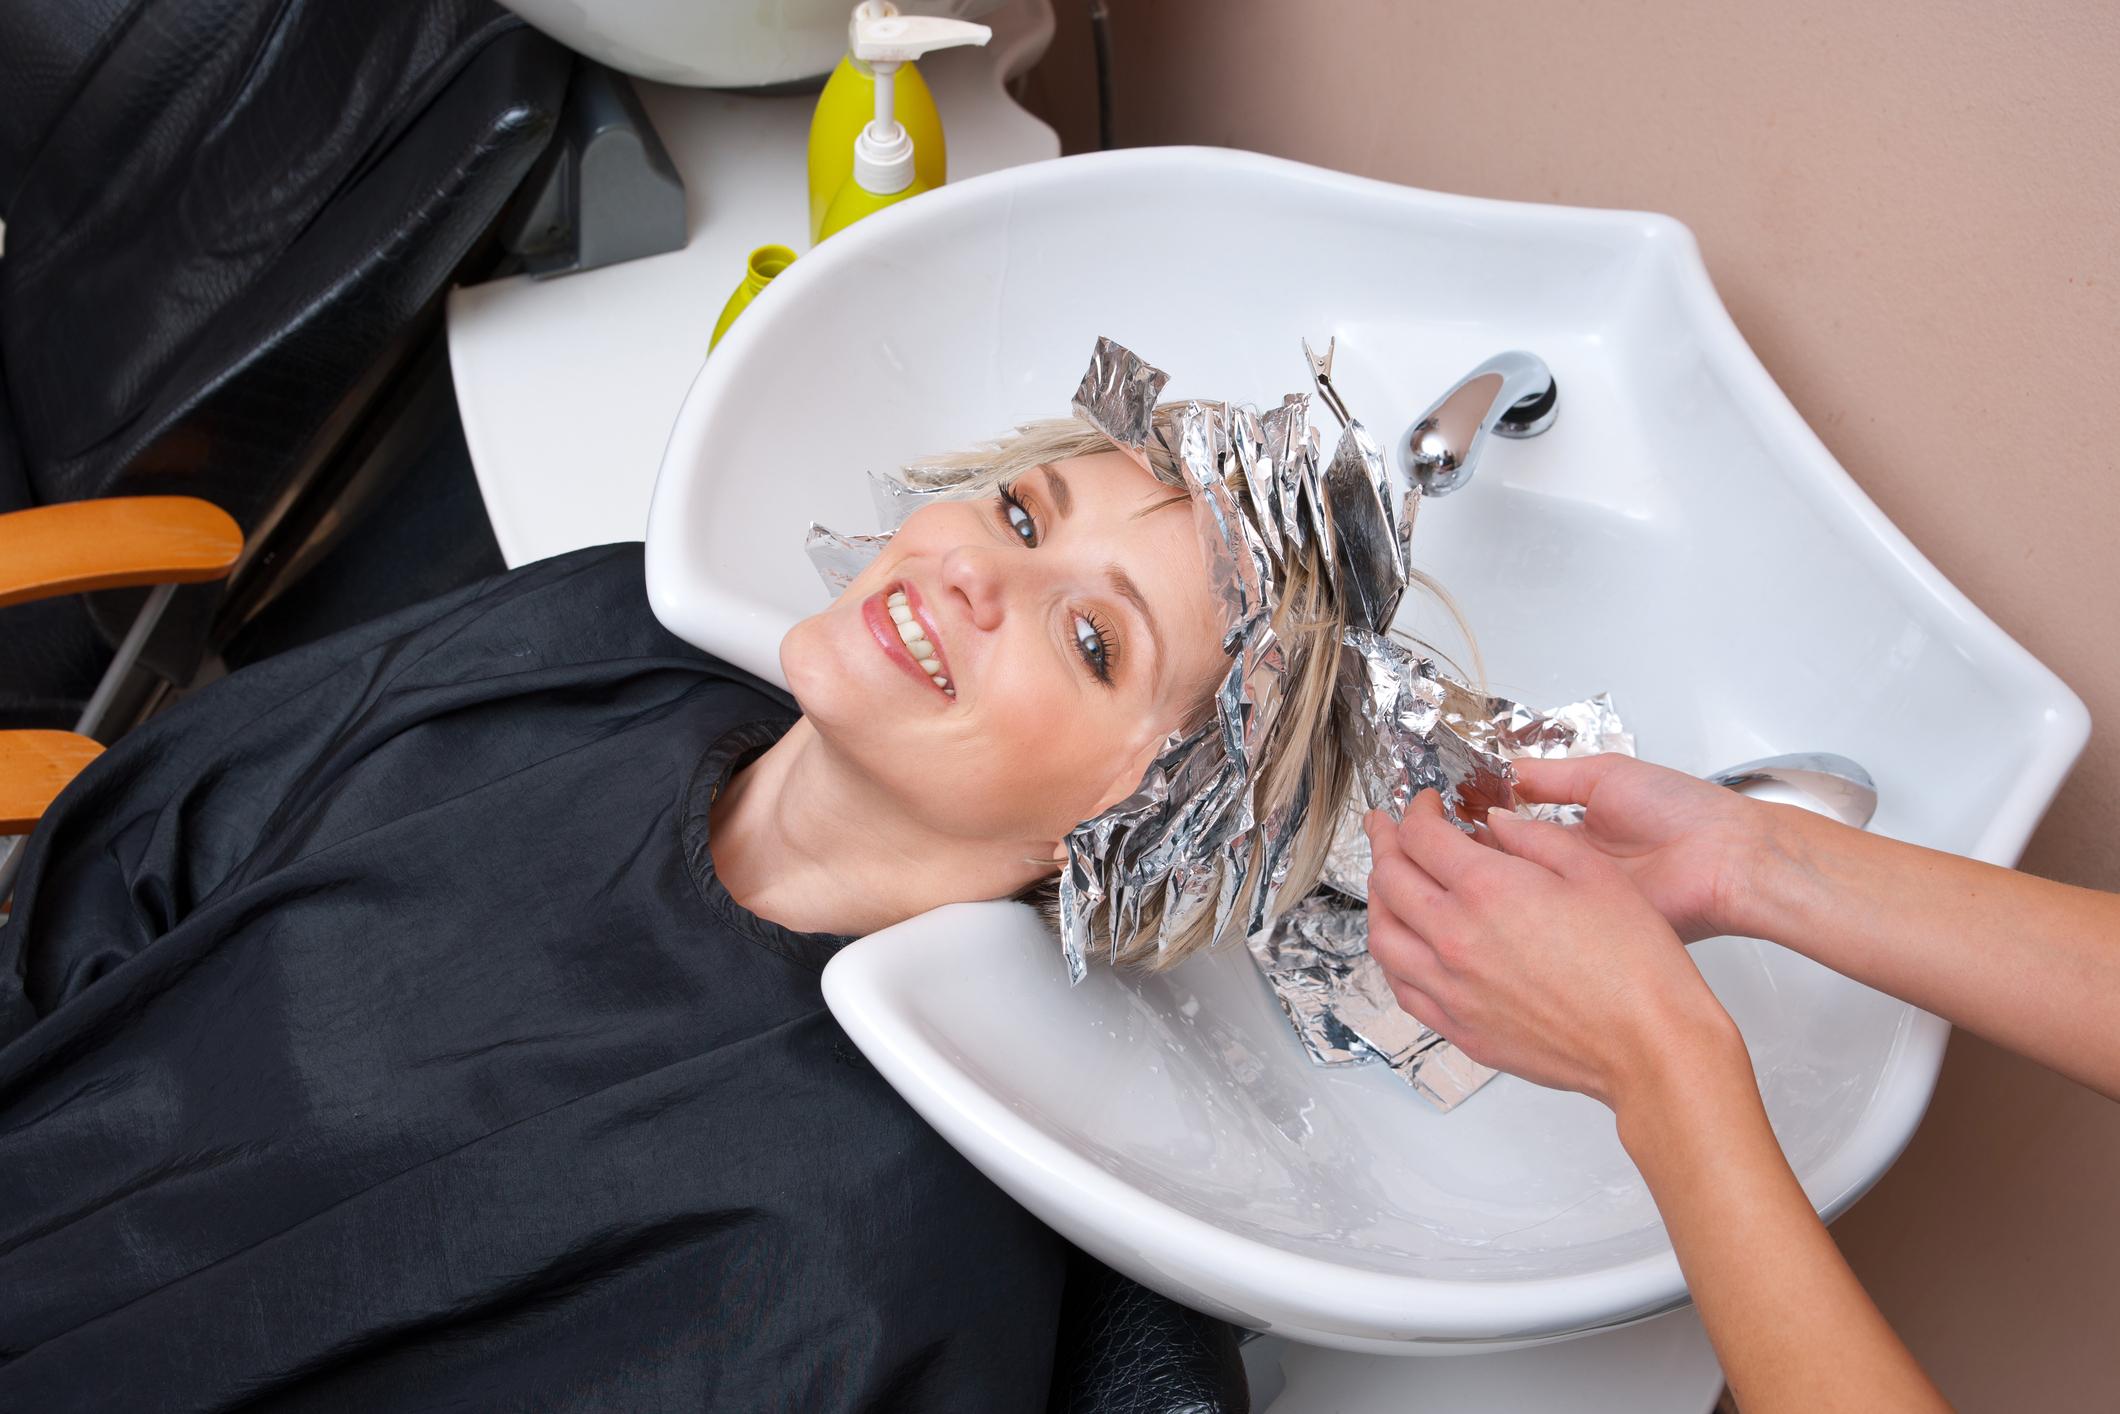 A salon customer having her hair colored